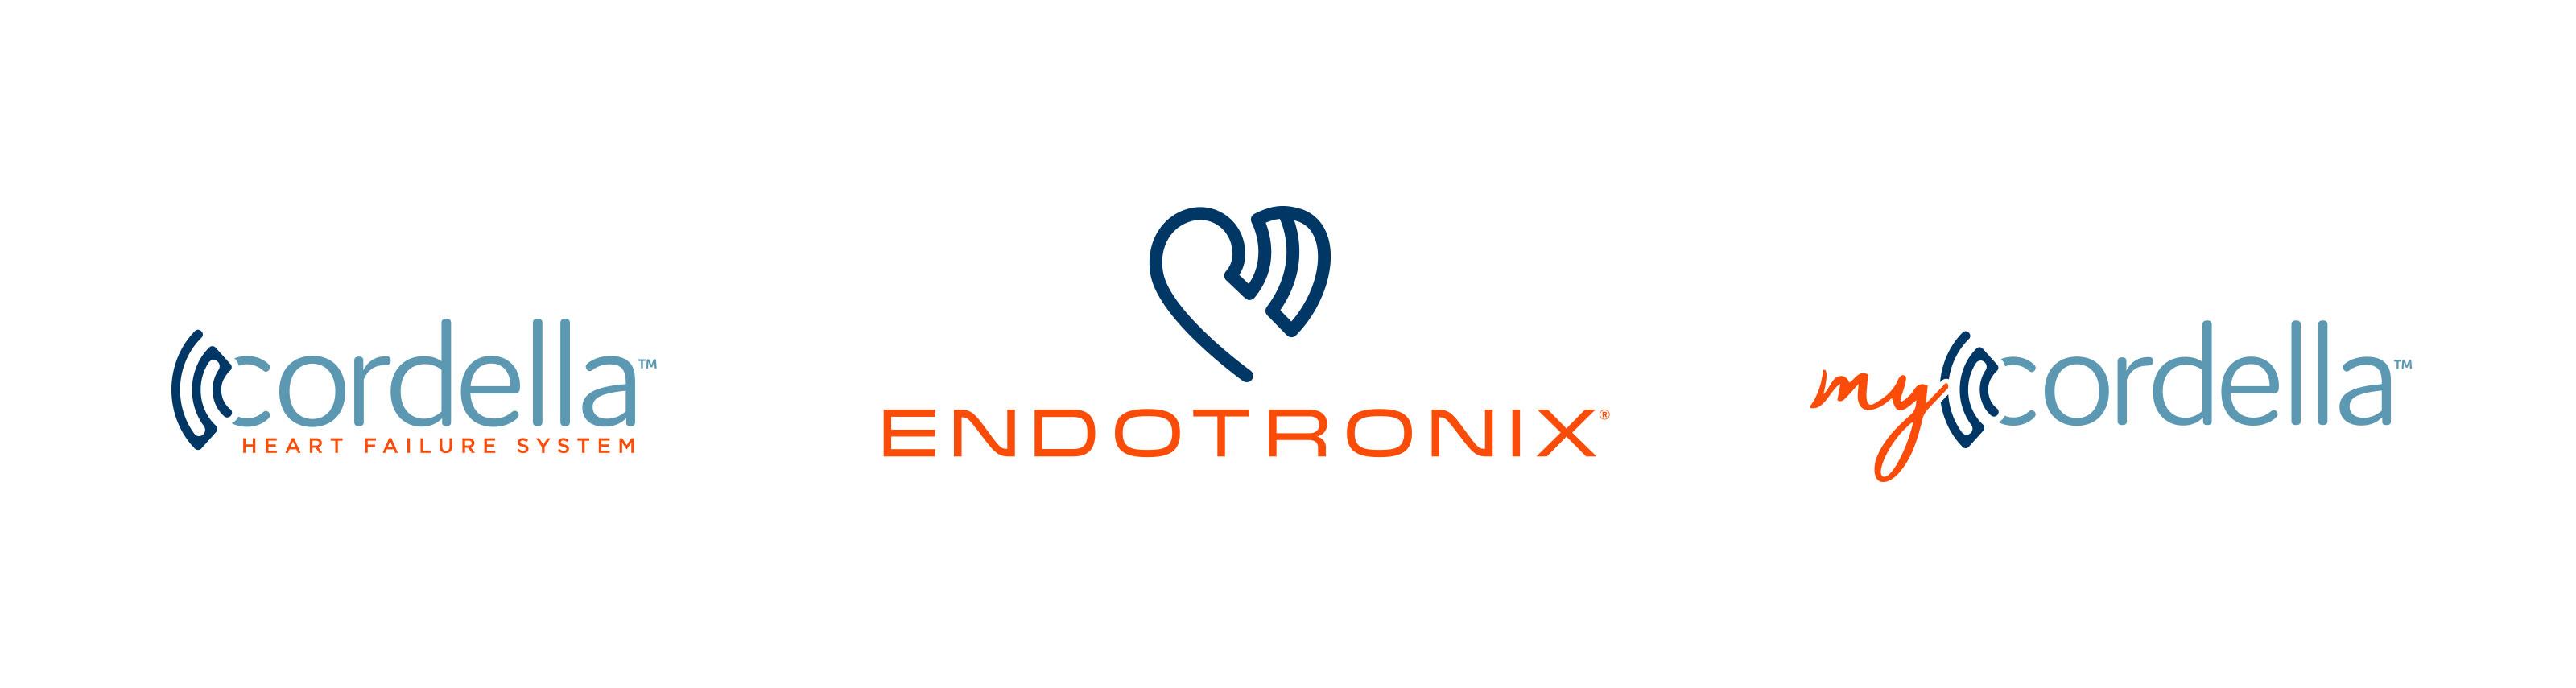 Endotronix Logos